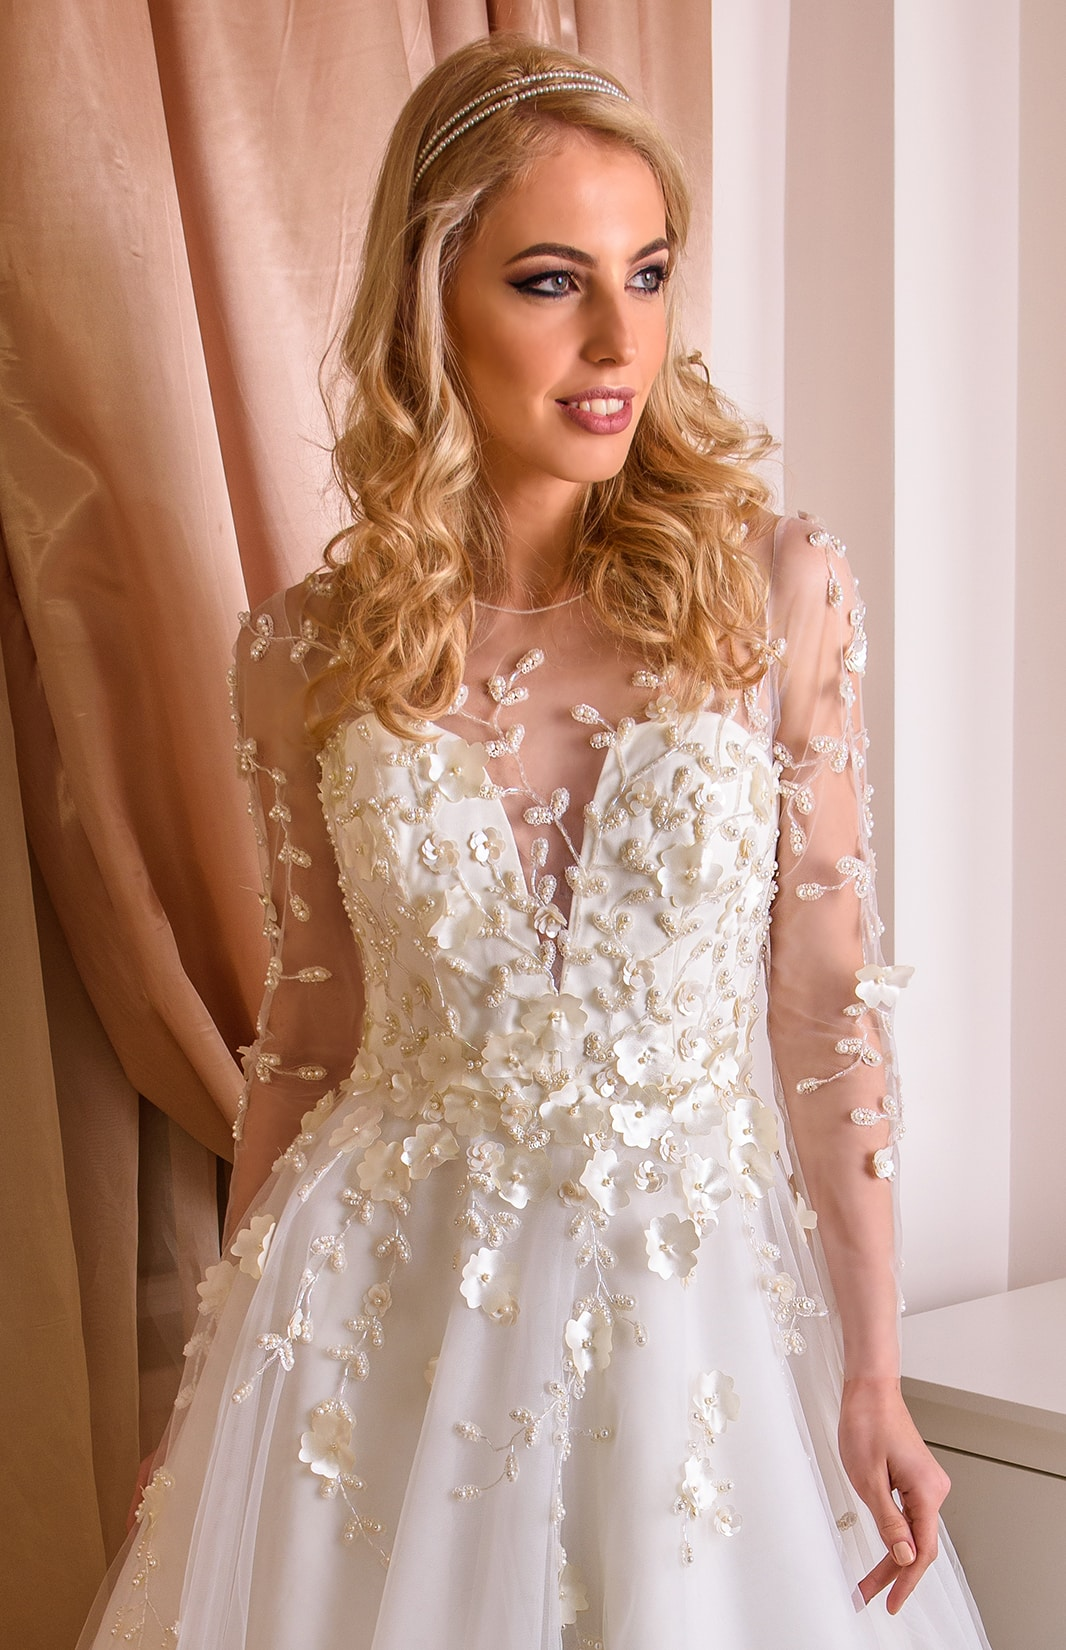 Natasha Model - Colectia Baroque - Adora Sposa (3)